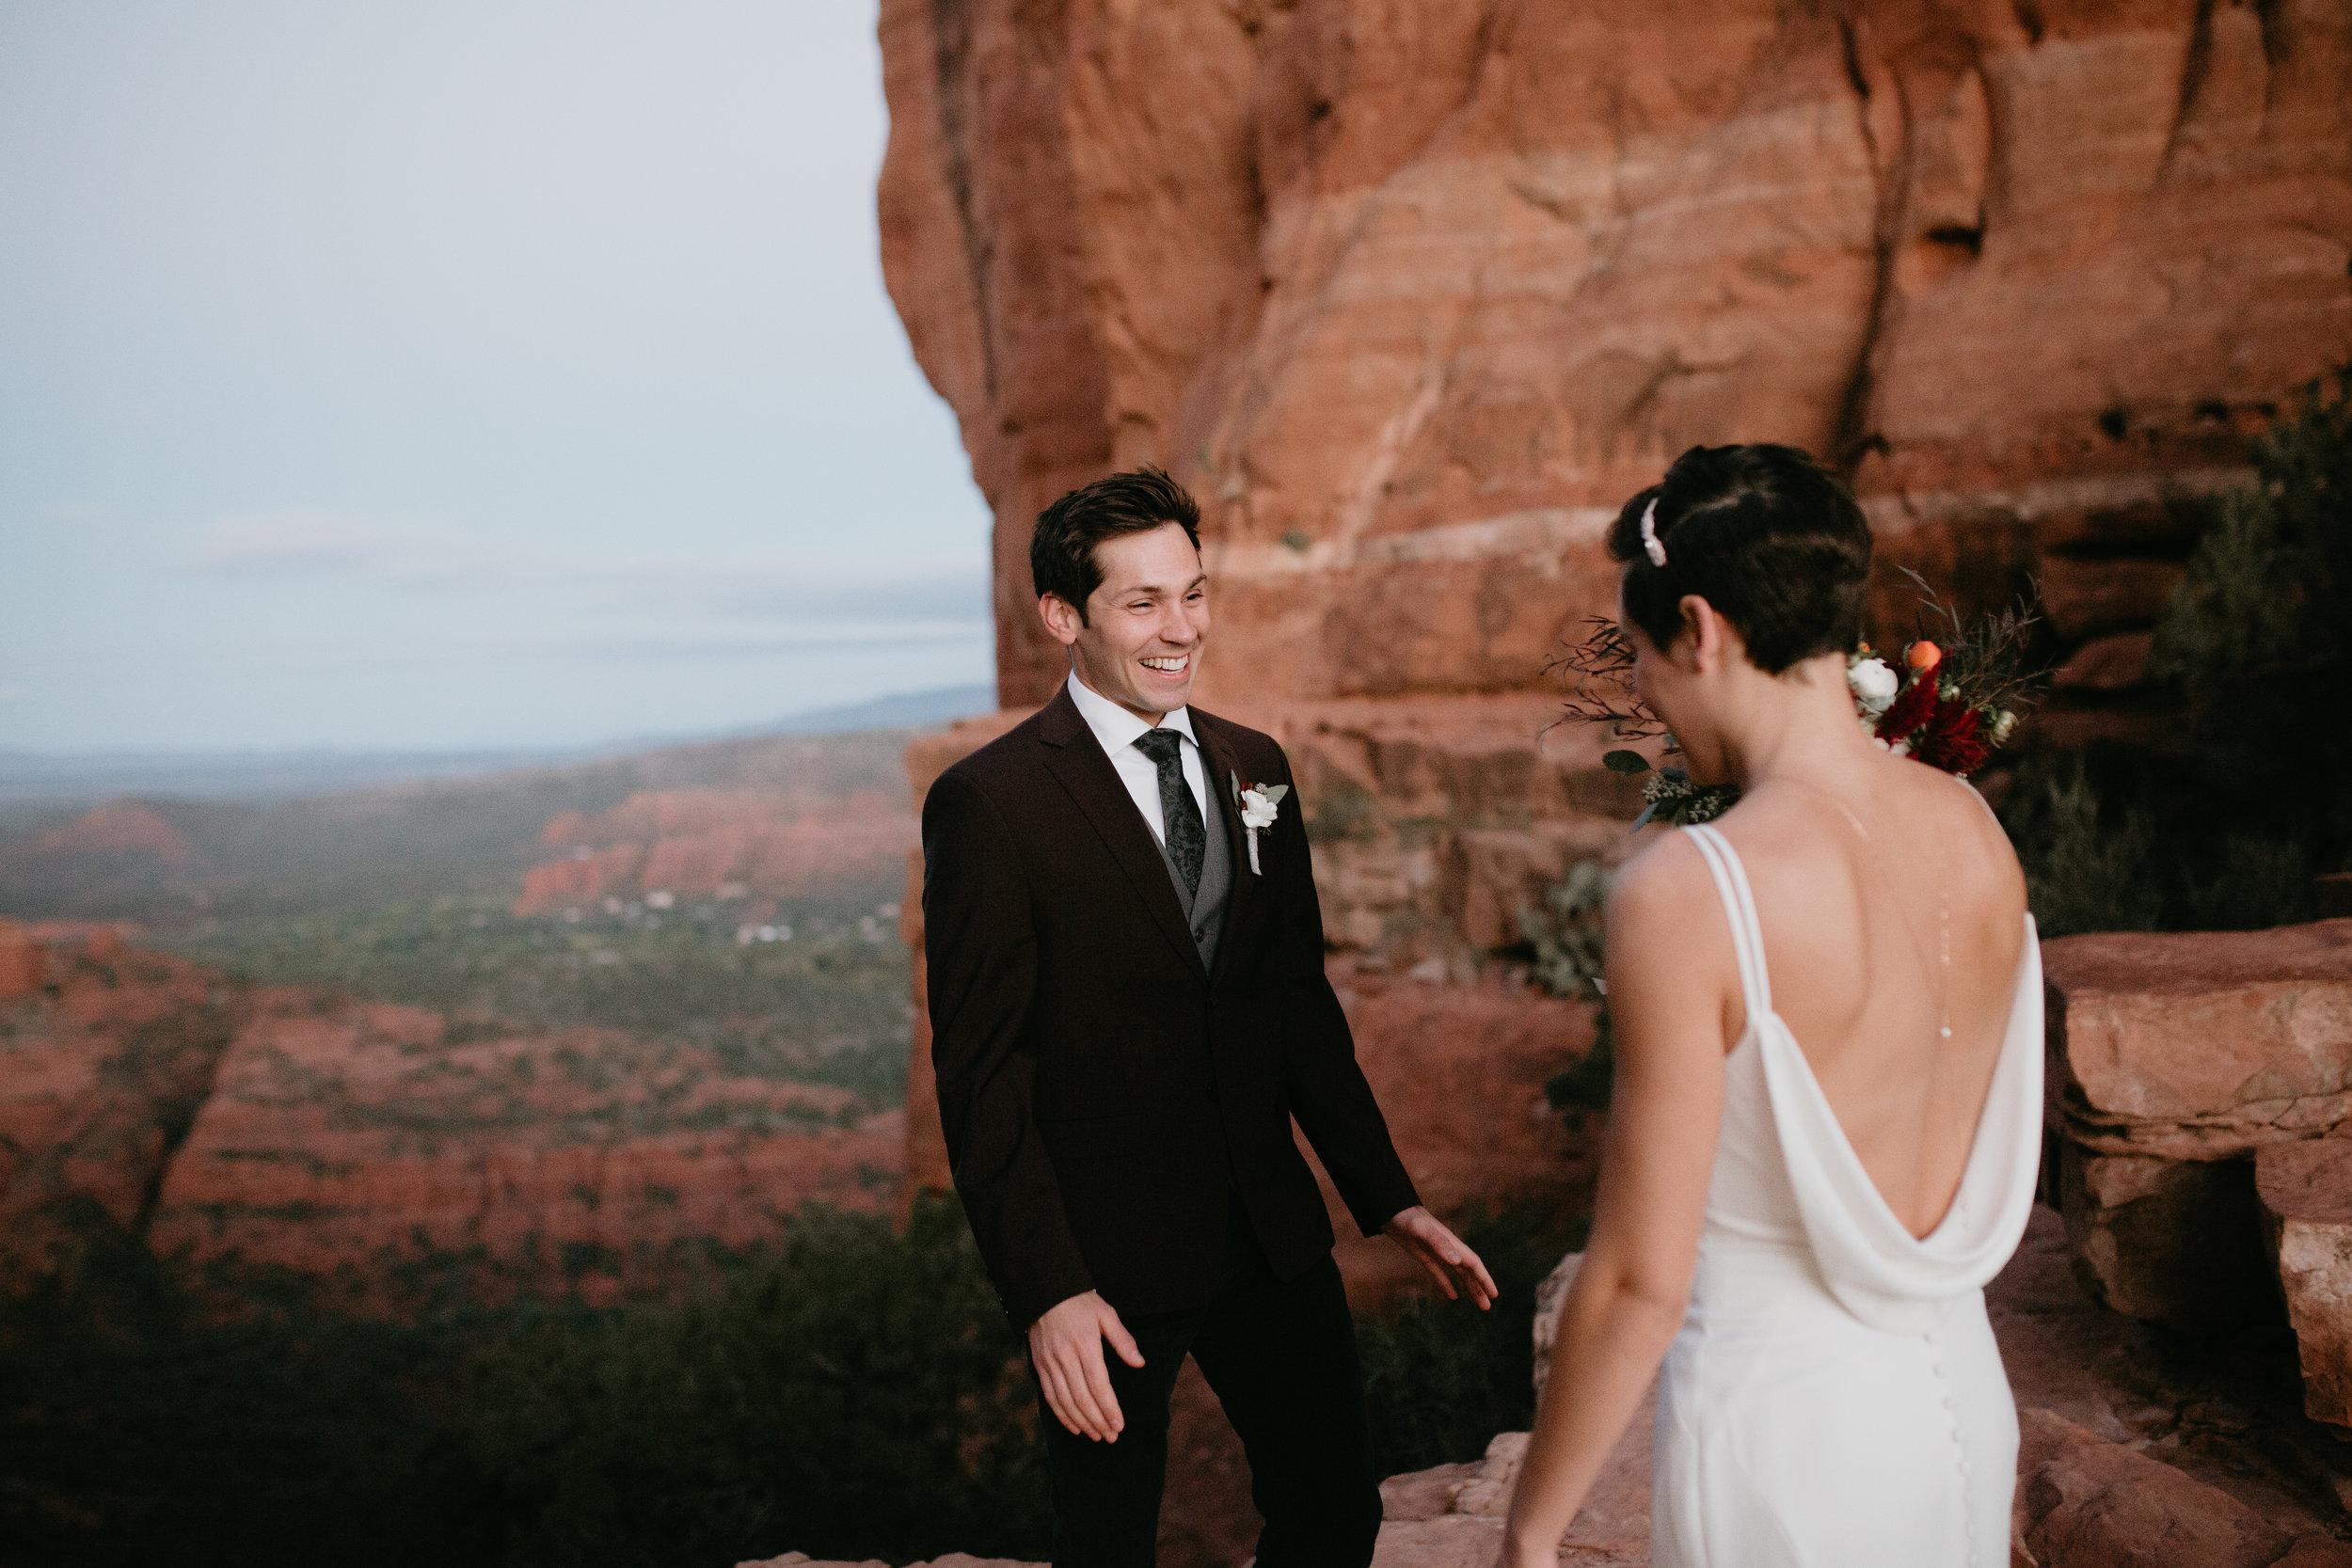 nicole-daacke-photography-sedona-arizona-destination-elopement-wedding-photographer-catherdral-rock-hiking-elopement-sedona-river-elopement-photos-desert-rock-wedding-photographer-laid-back-spontaneous-elopement-6.jpg